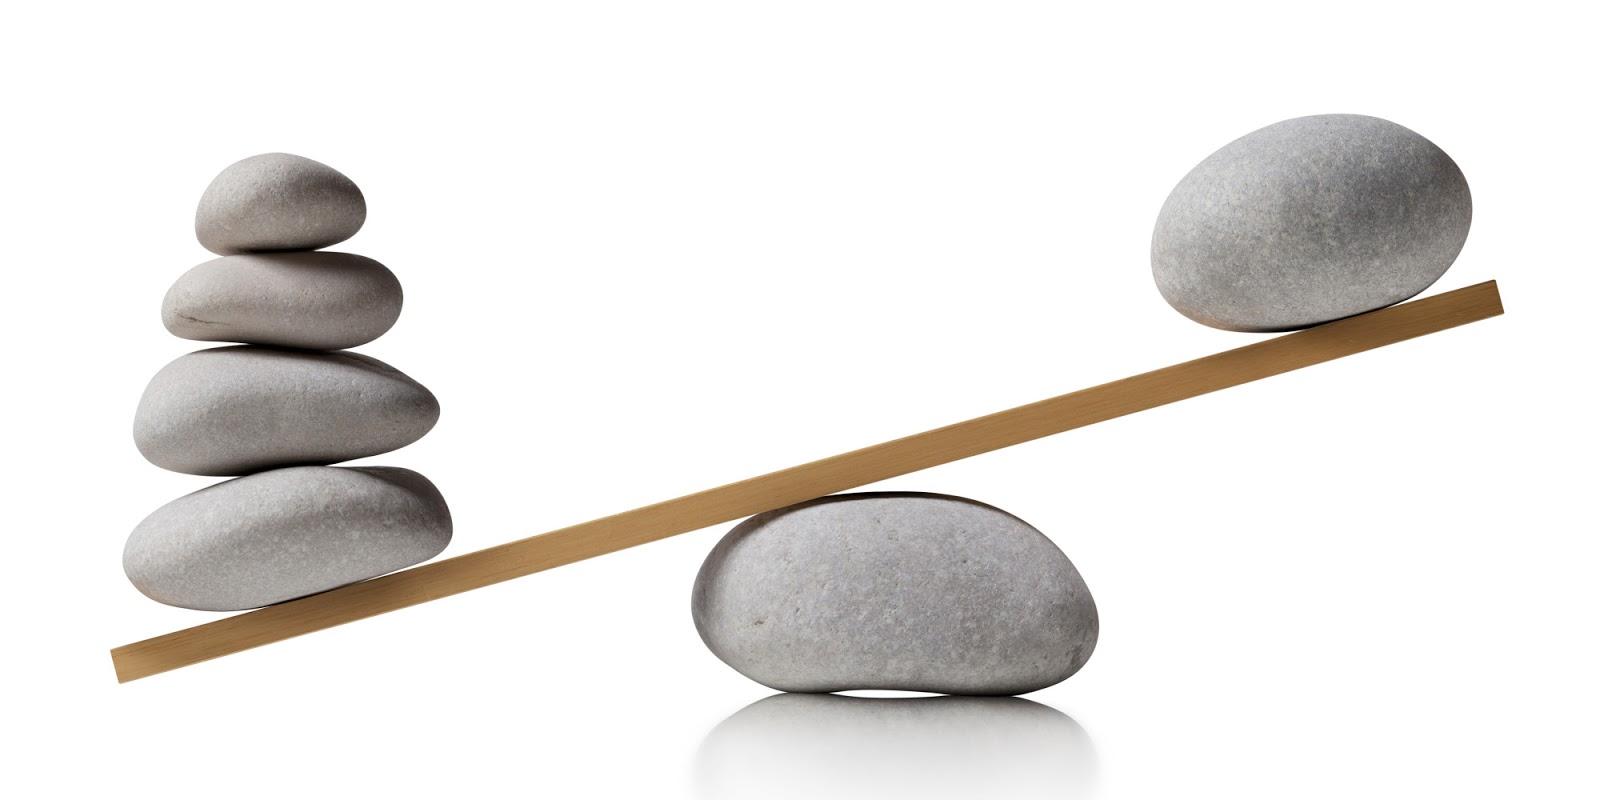 two-rocks-balacing-on-a-rock